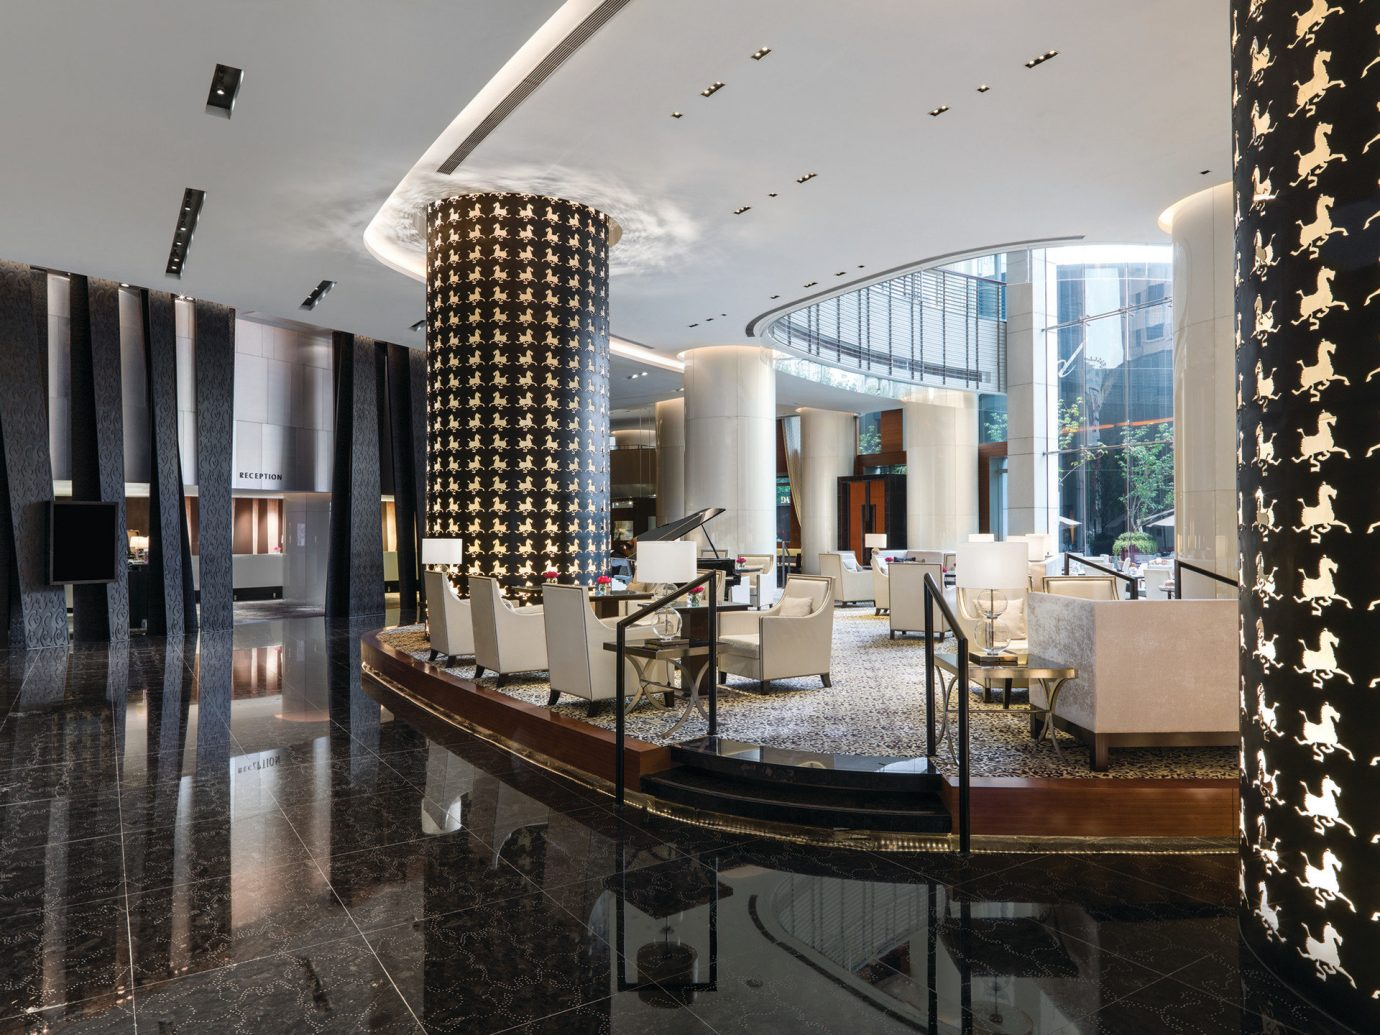 Boutique Hotels Luxury Travel Lobby Architecture interior design estate lighting condominium Design tourist attraction convention center